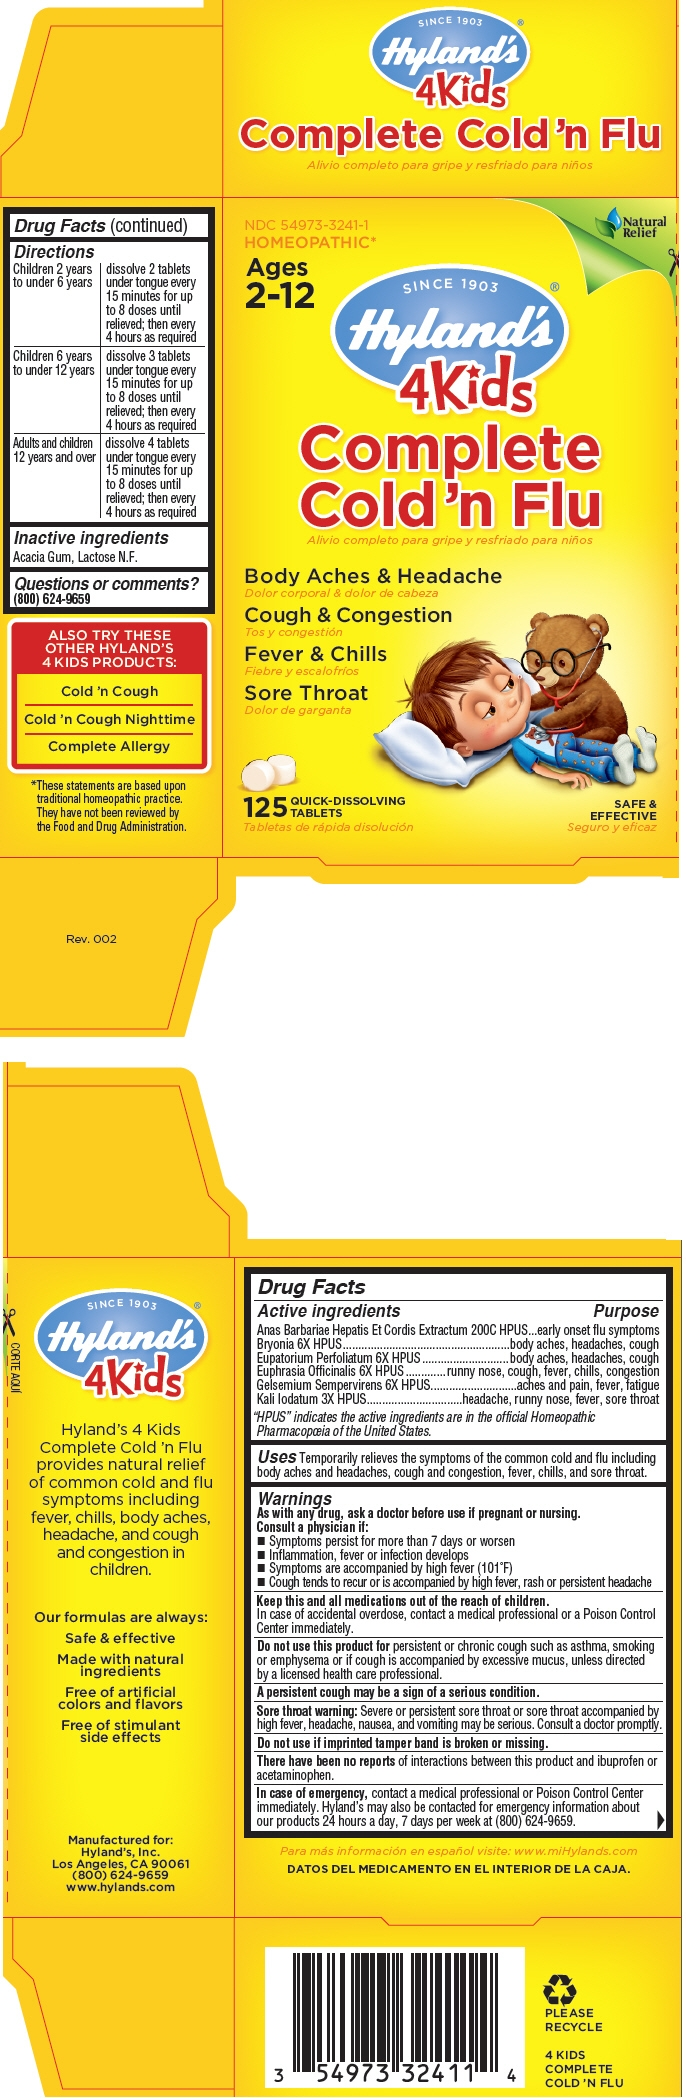 PRINCIPAL DISPLAY PANEL - 125 Tablet Bottle Carton